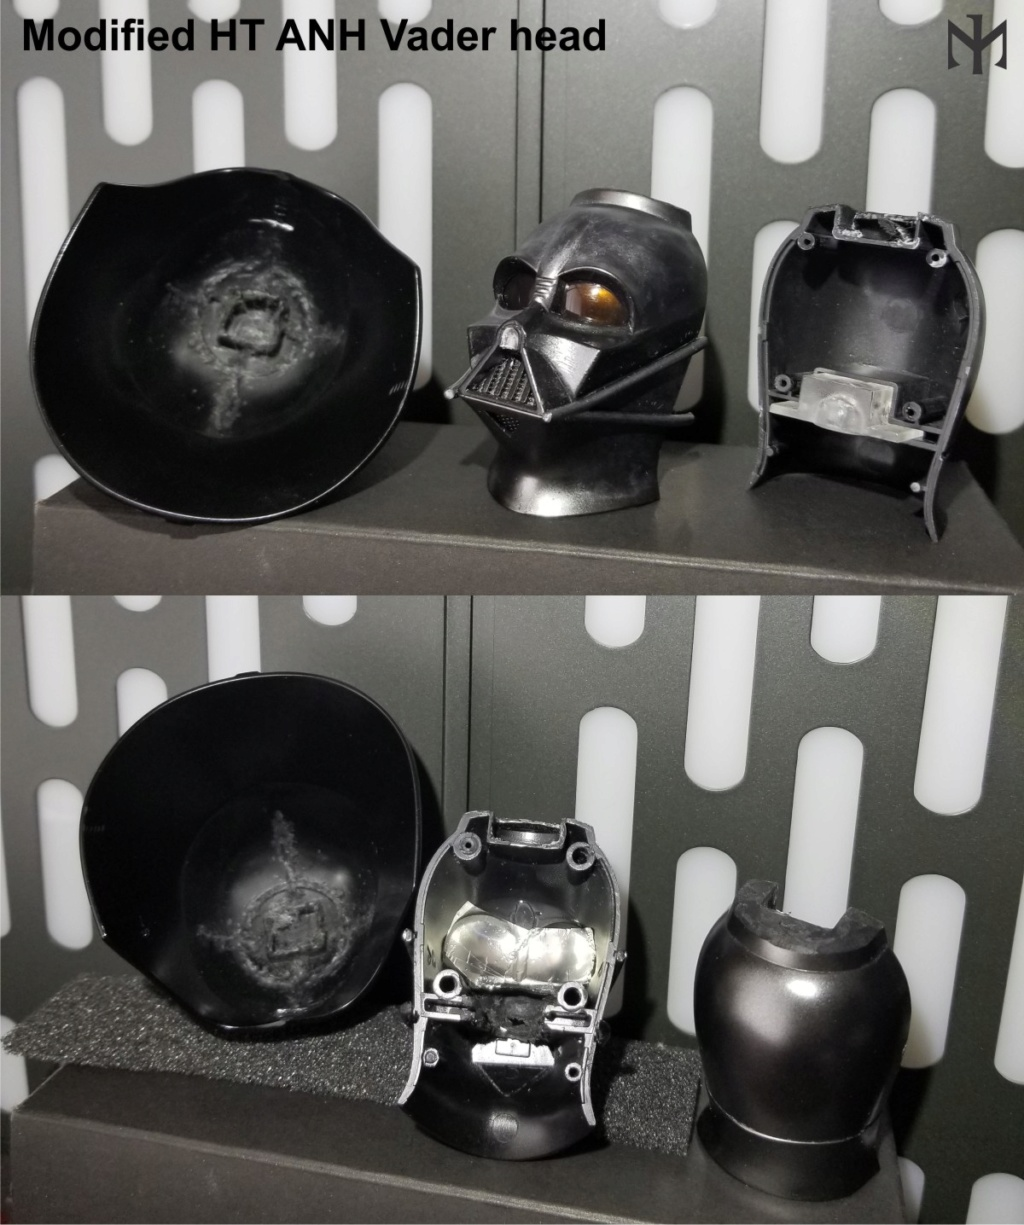 STAR WARS New customizing Hot Toys ESB Vader head Htdvan10